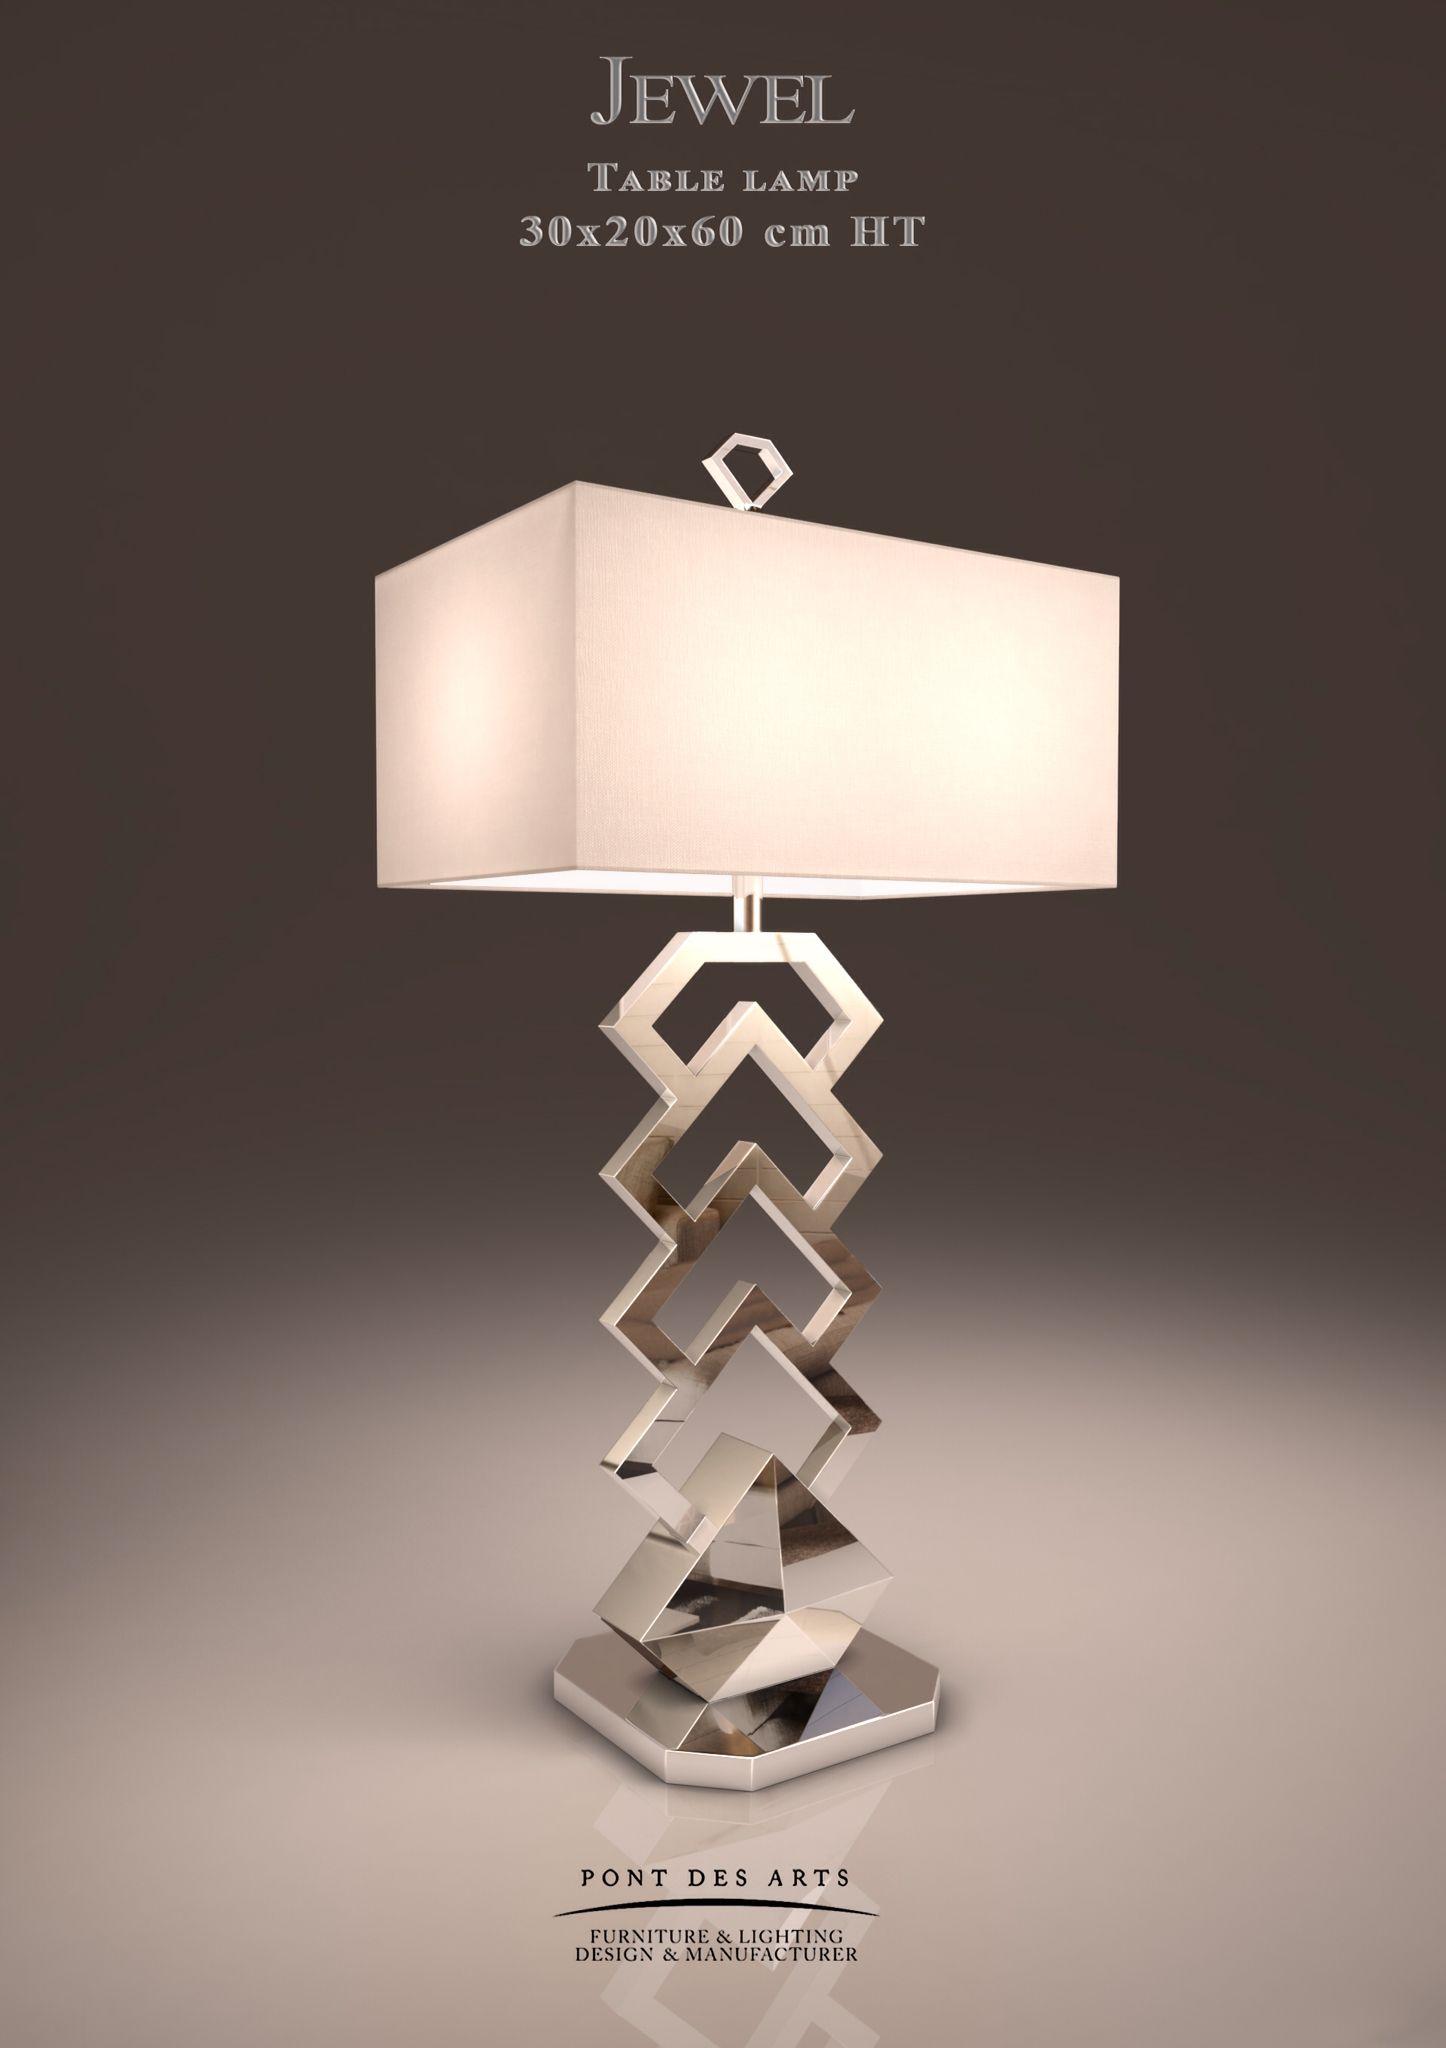 Jewel Table Lamp - Designer MONZER Hammoud - Pont des Arts ...